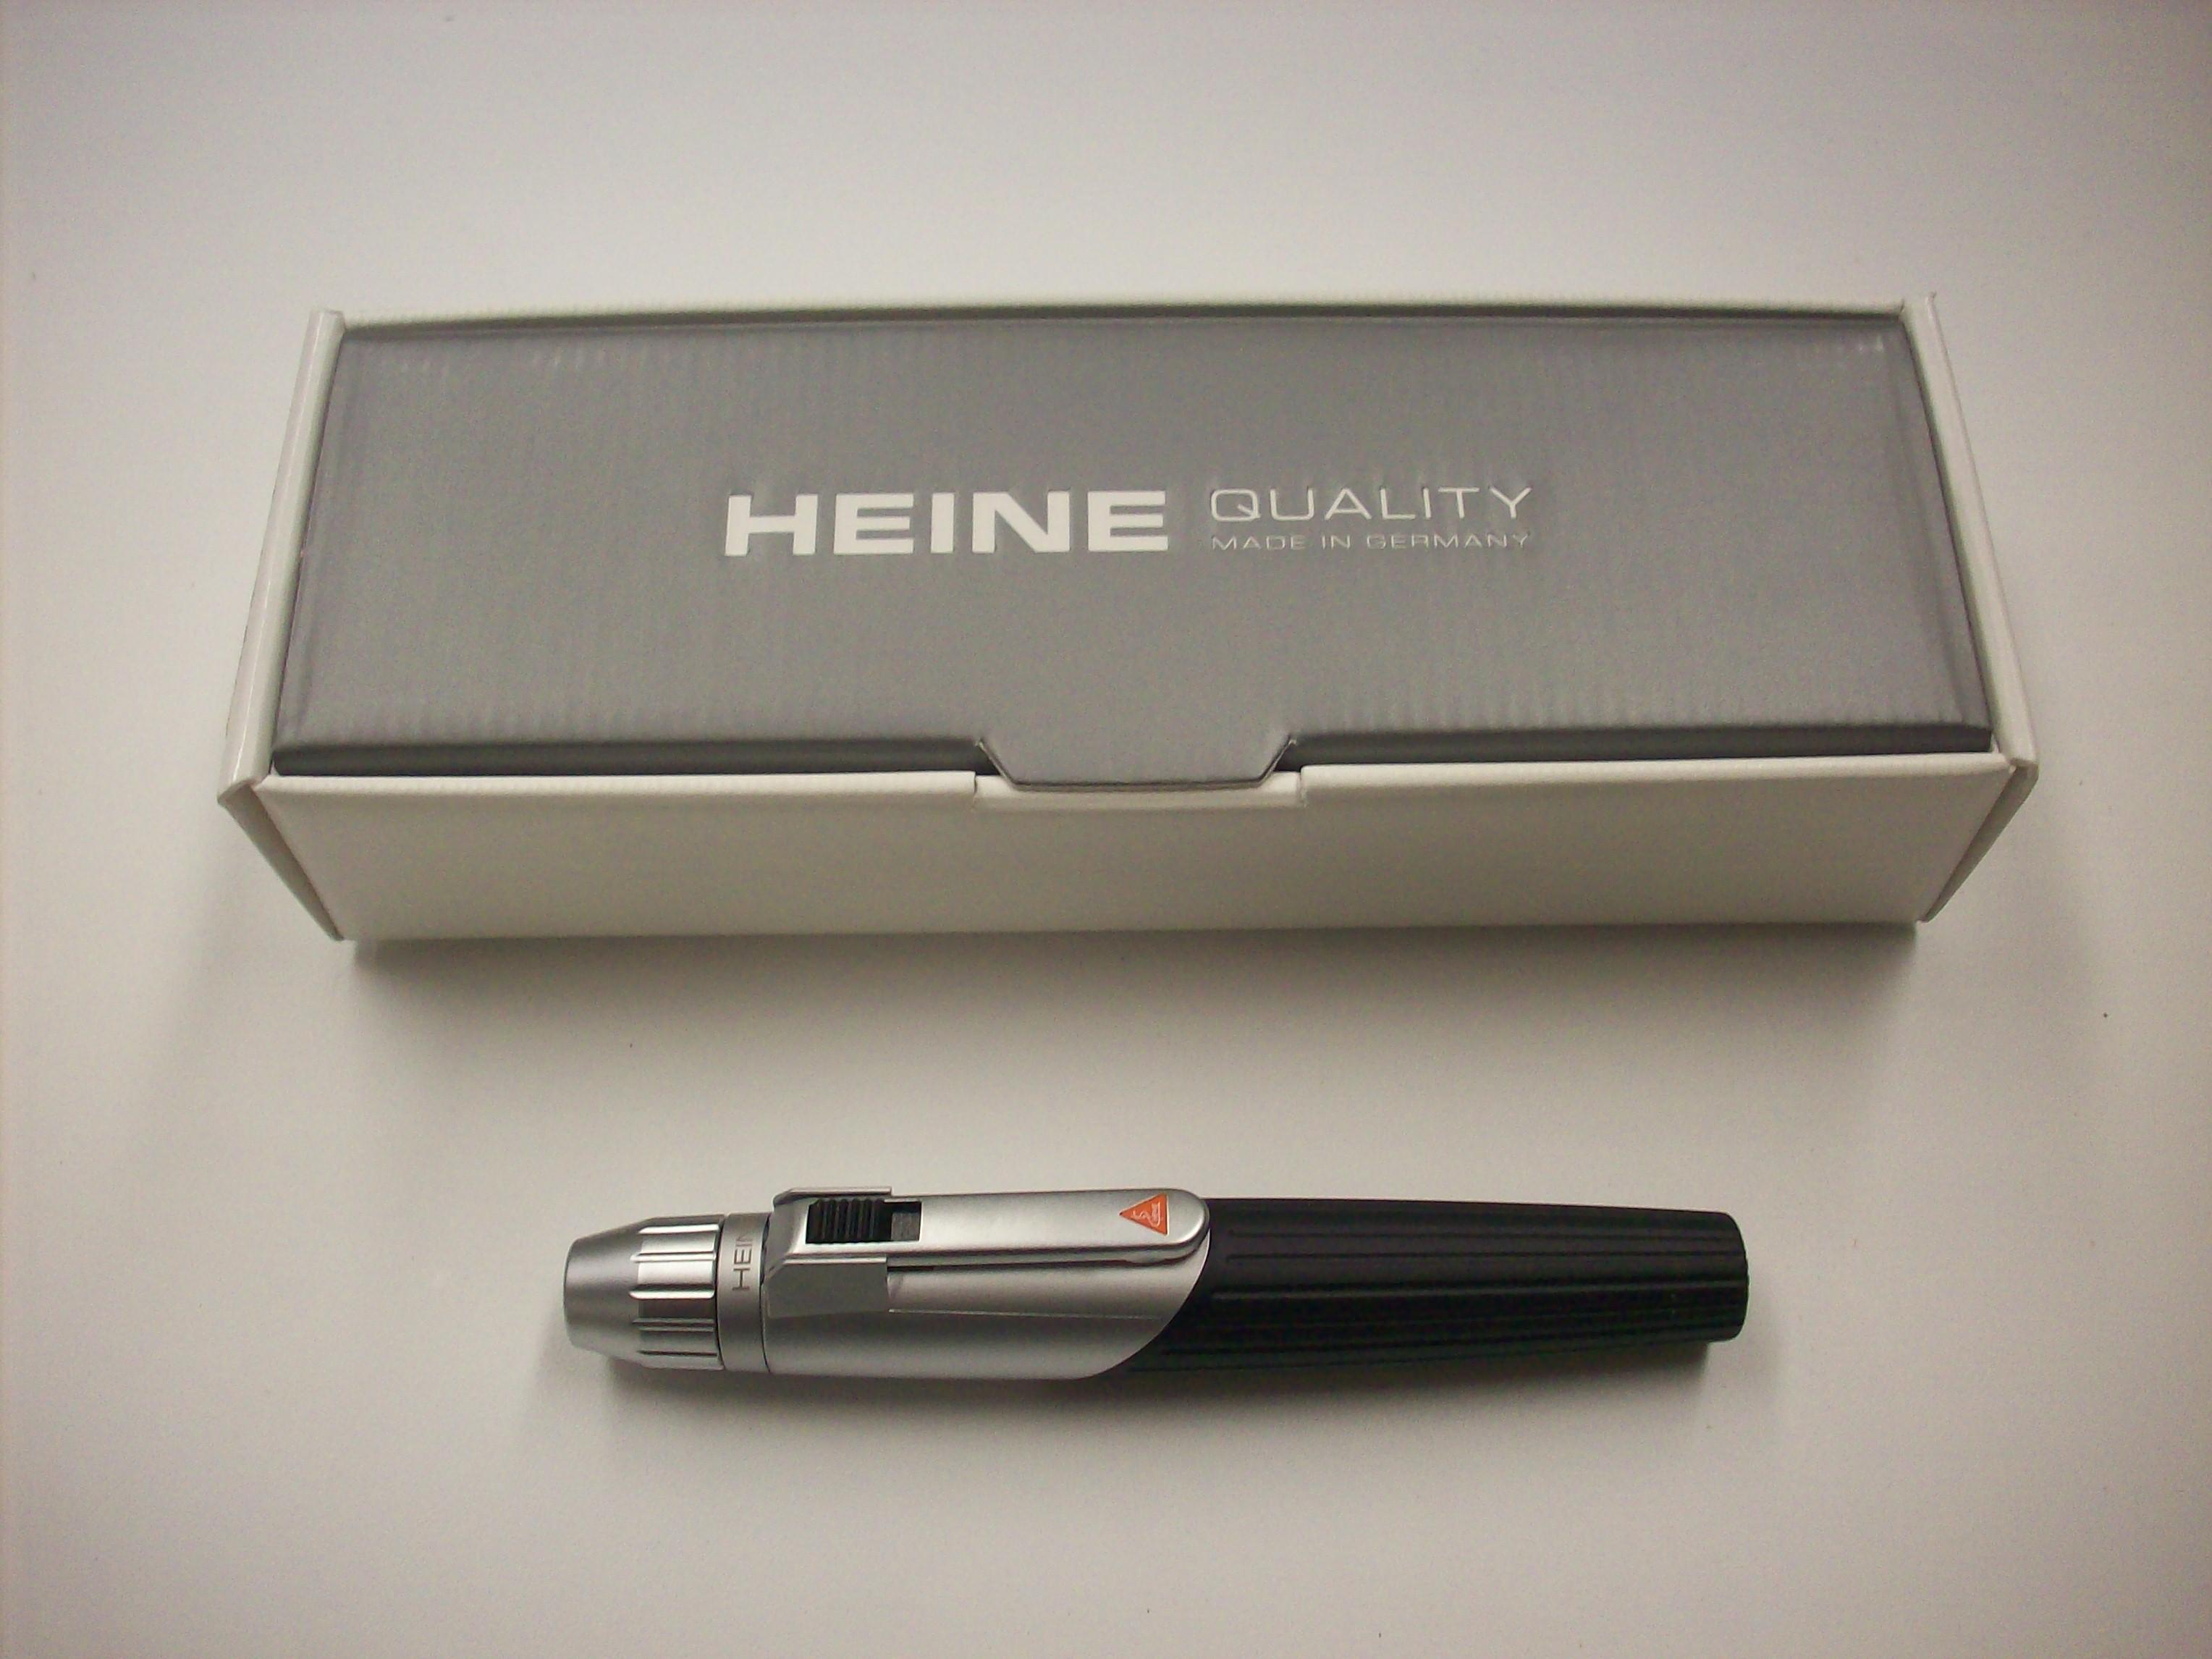 Heine Cliplight, HL-1